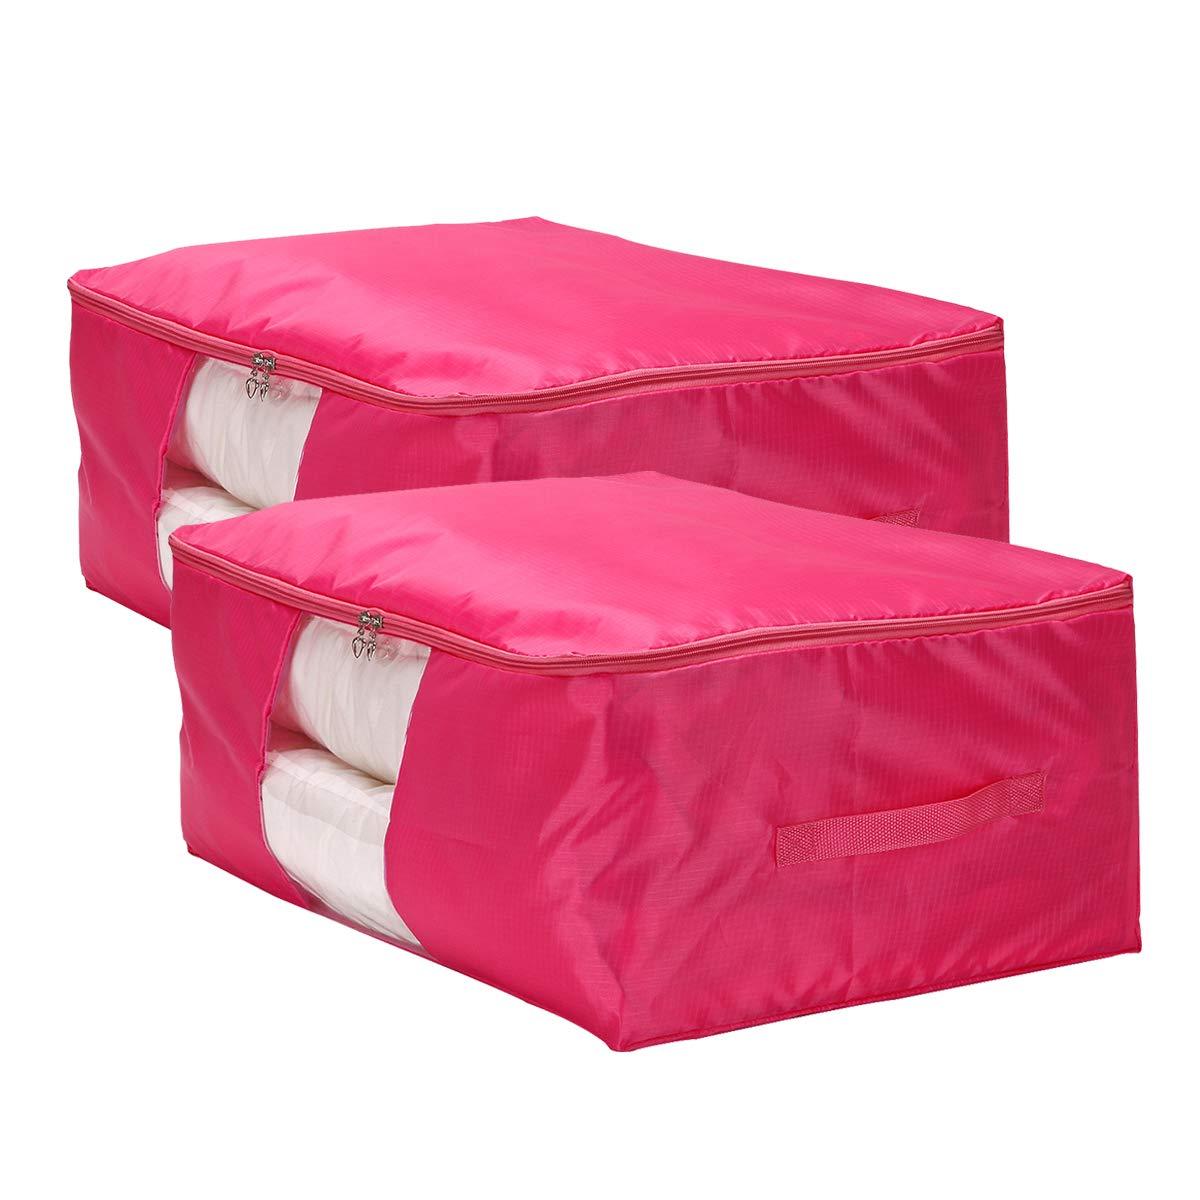 VEAMOR Comforter Storage Bags Pillow